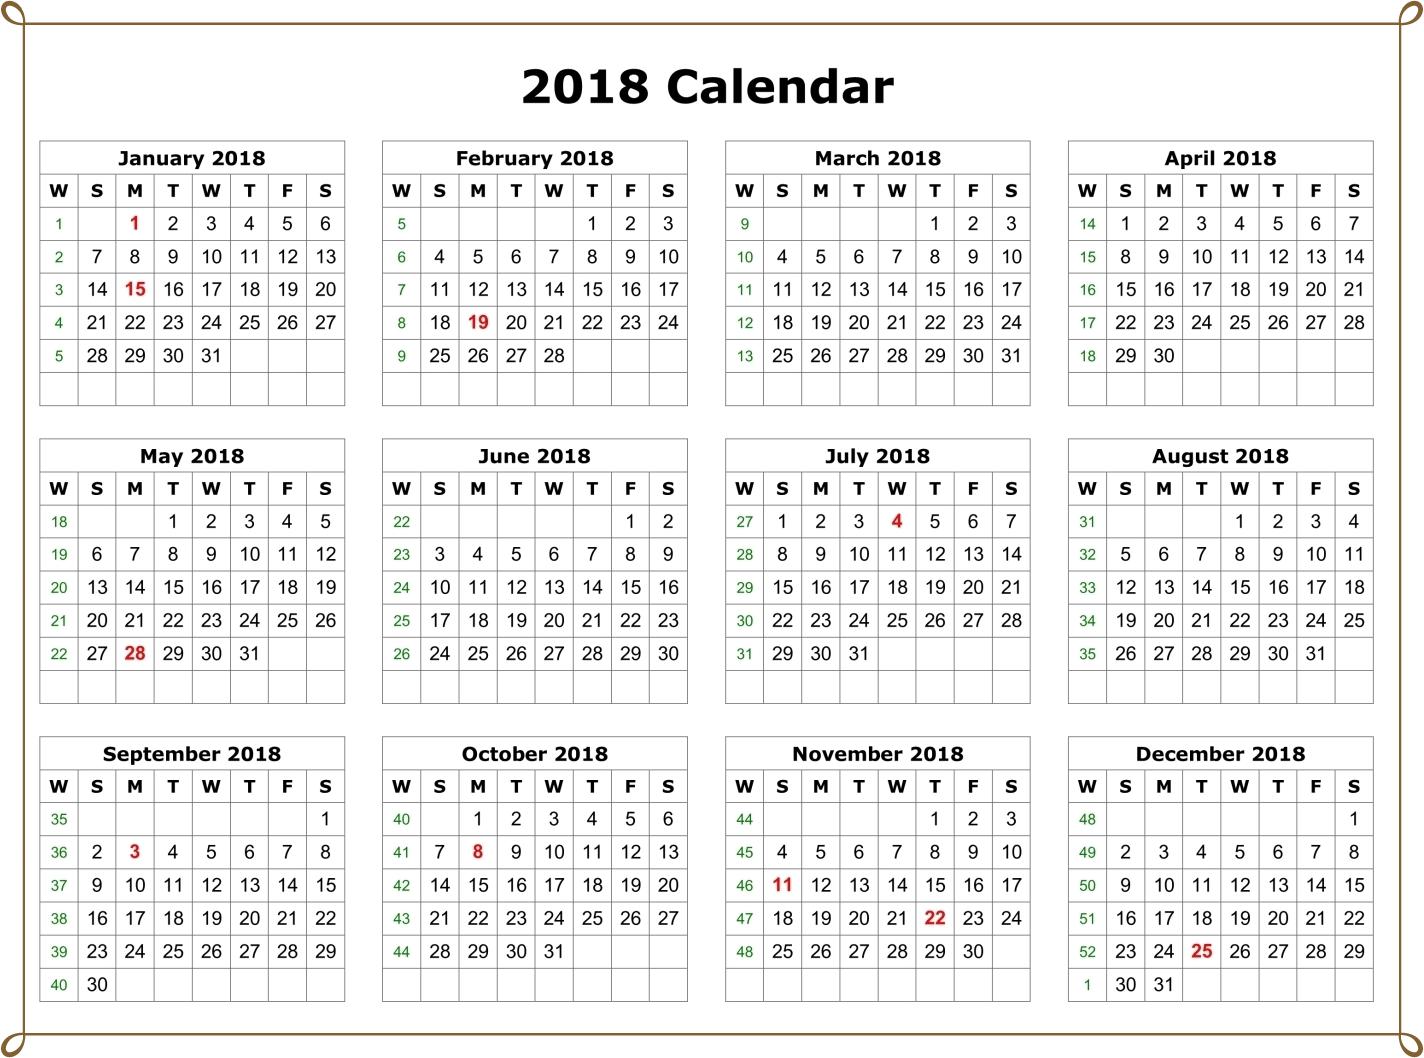 png transparent images. Clipart calendar april 2018